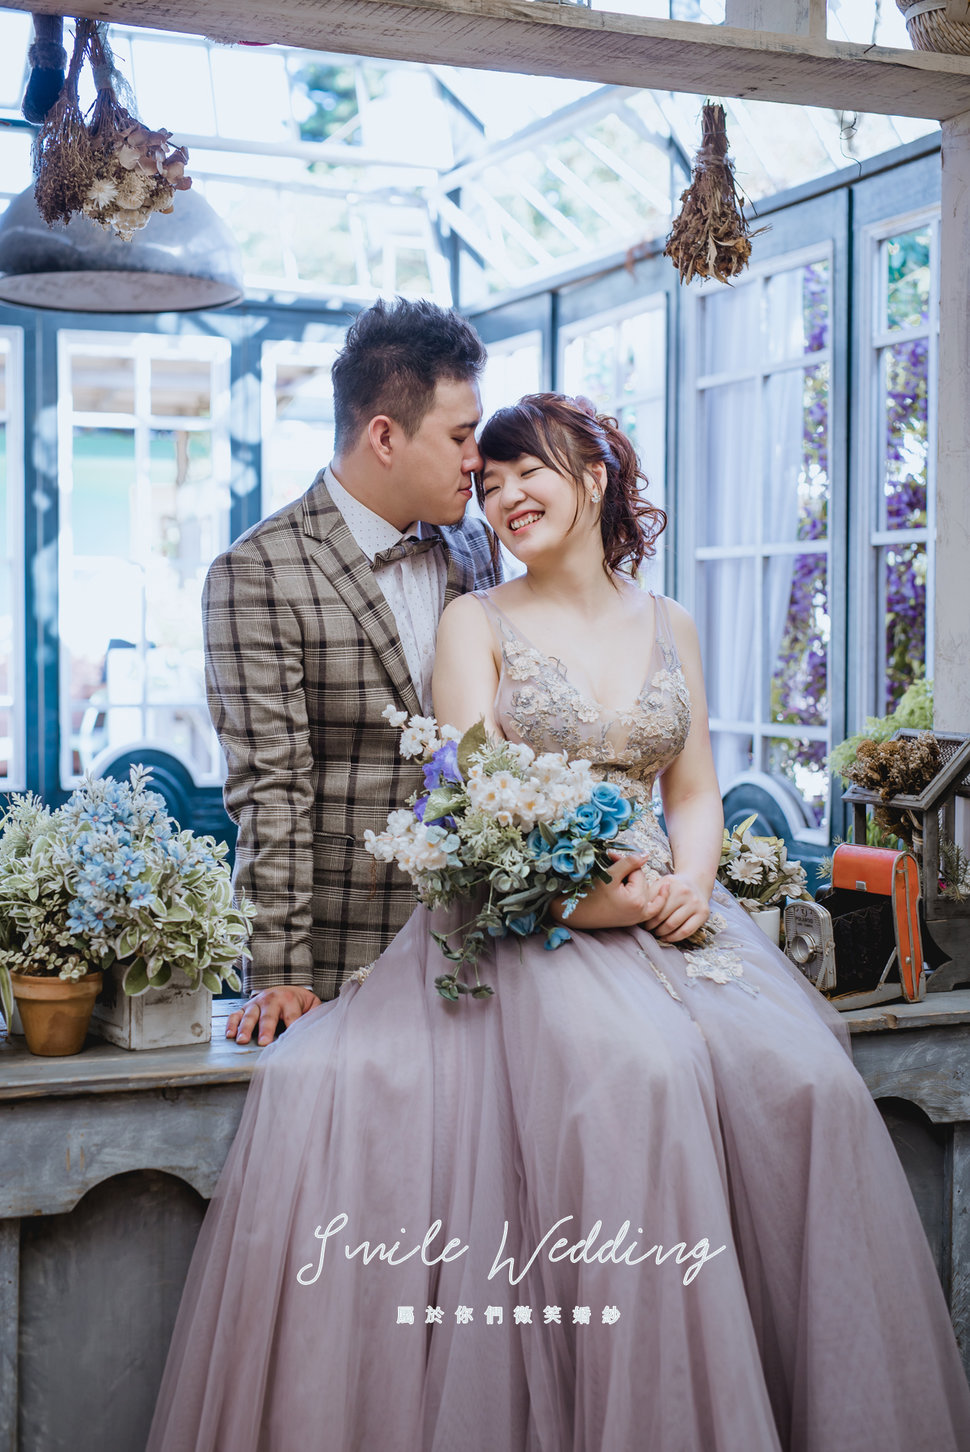 WEI_4505 - Smile wedding 微笑婚紗《結婚吧》